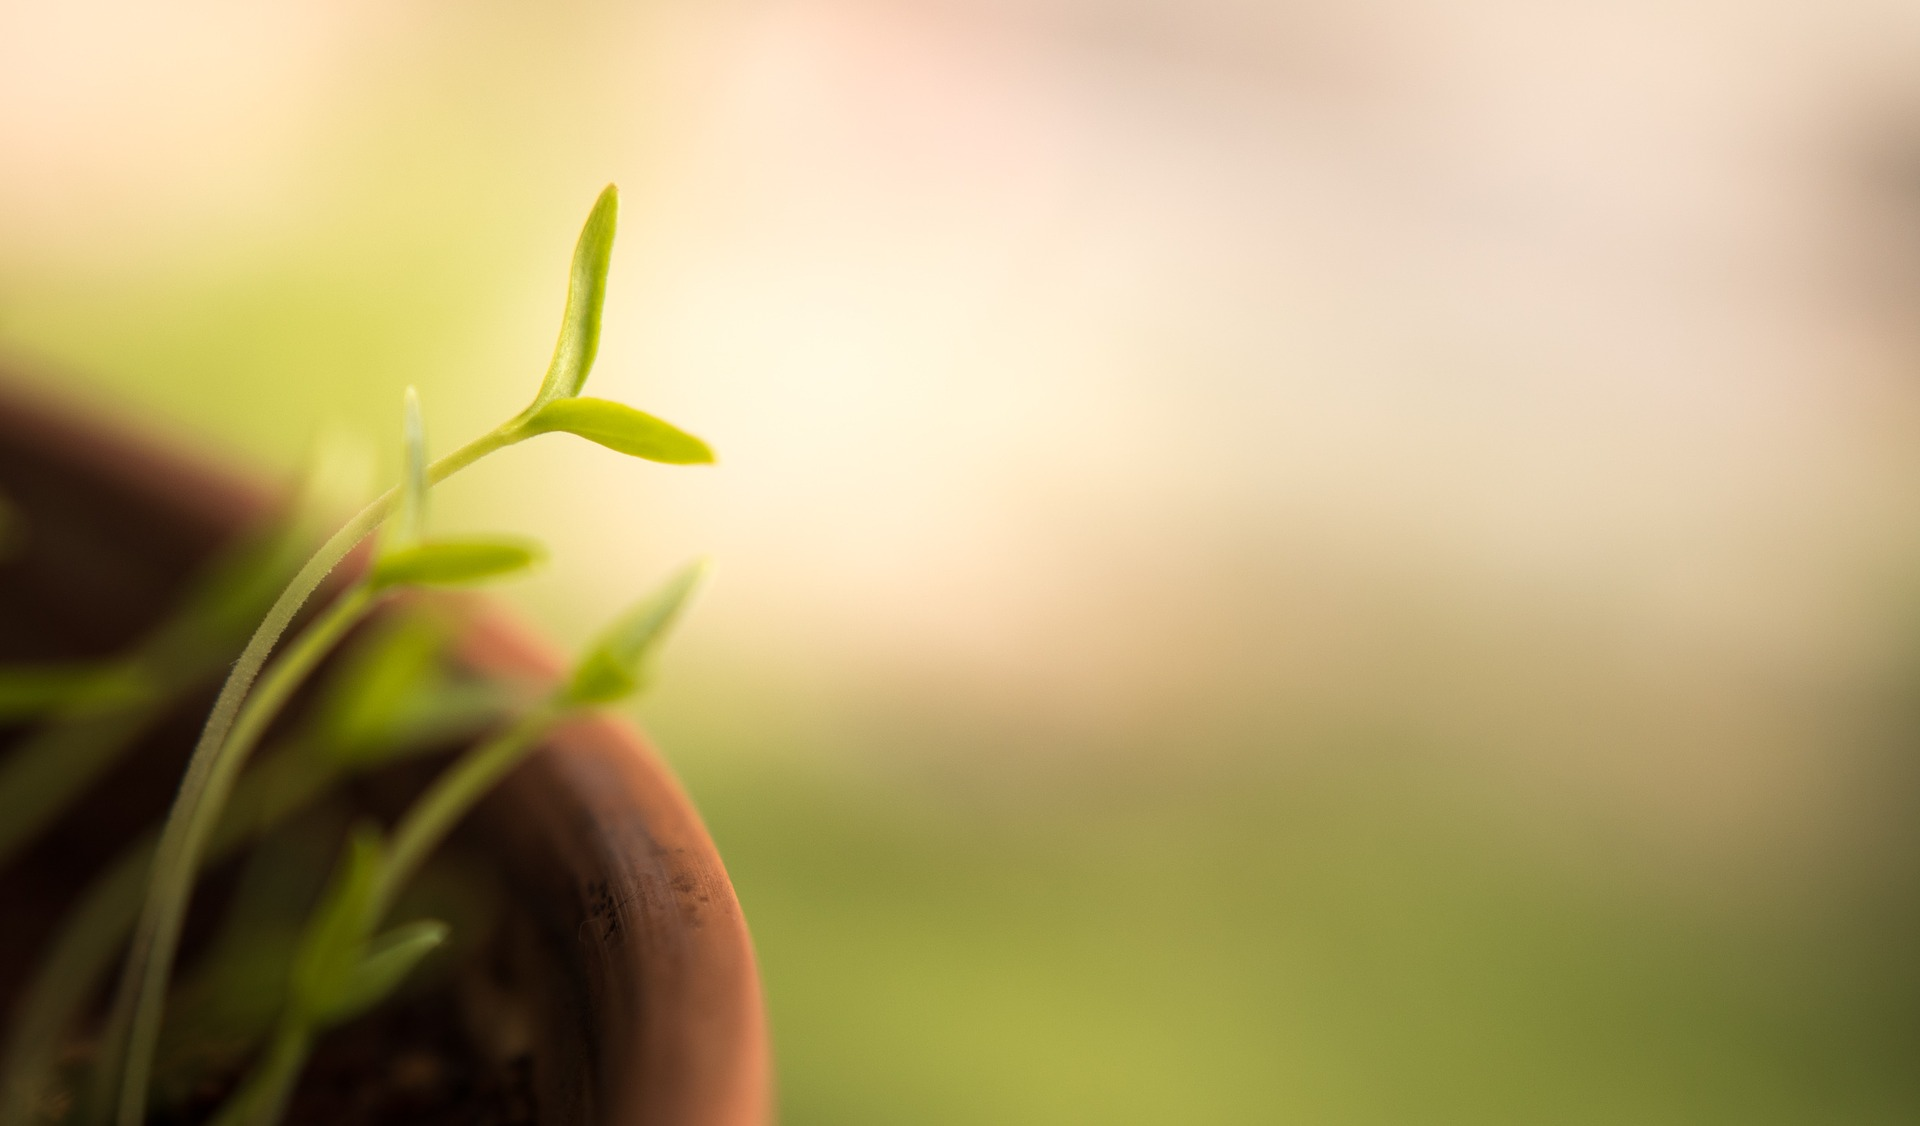 Fresh Growth (Plant Growing)